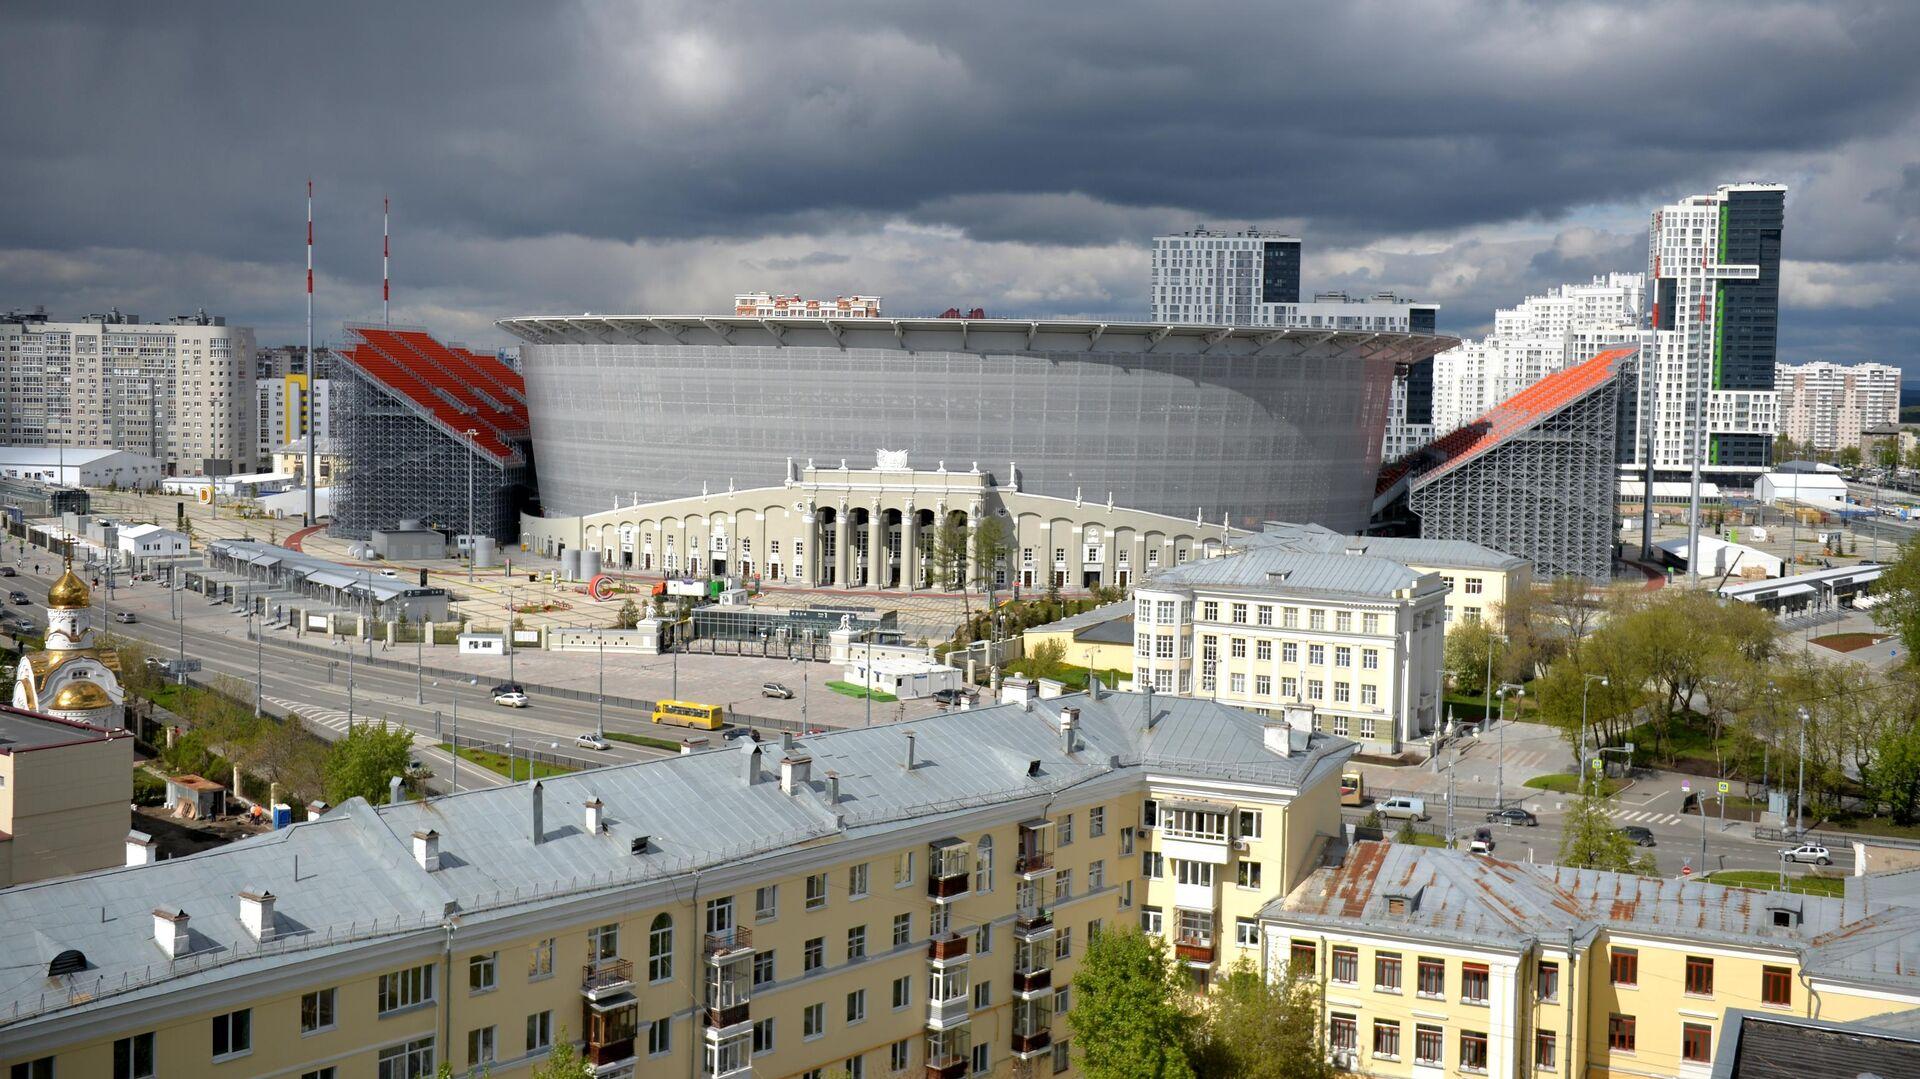 Вид на стадион Екатеринбург Арена - РИА Новости, 1920, 10.06.2021